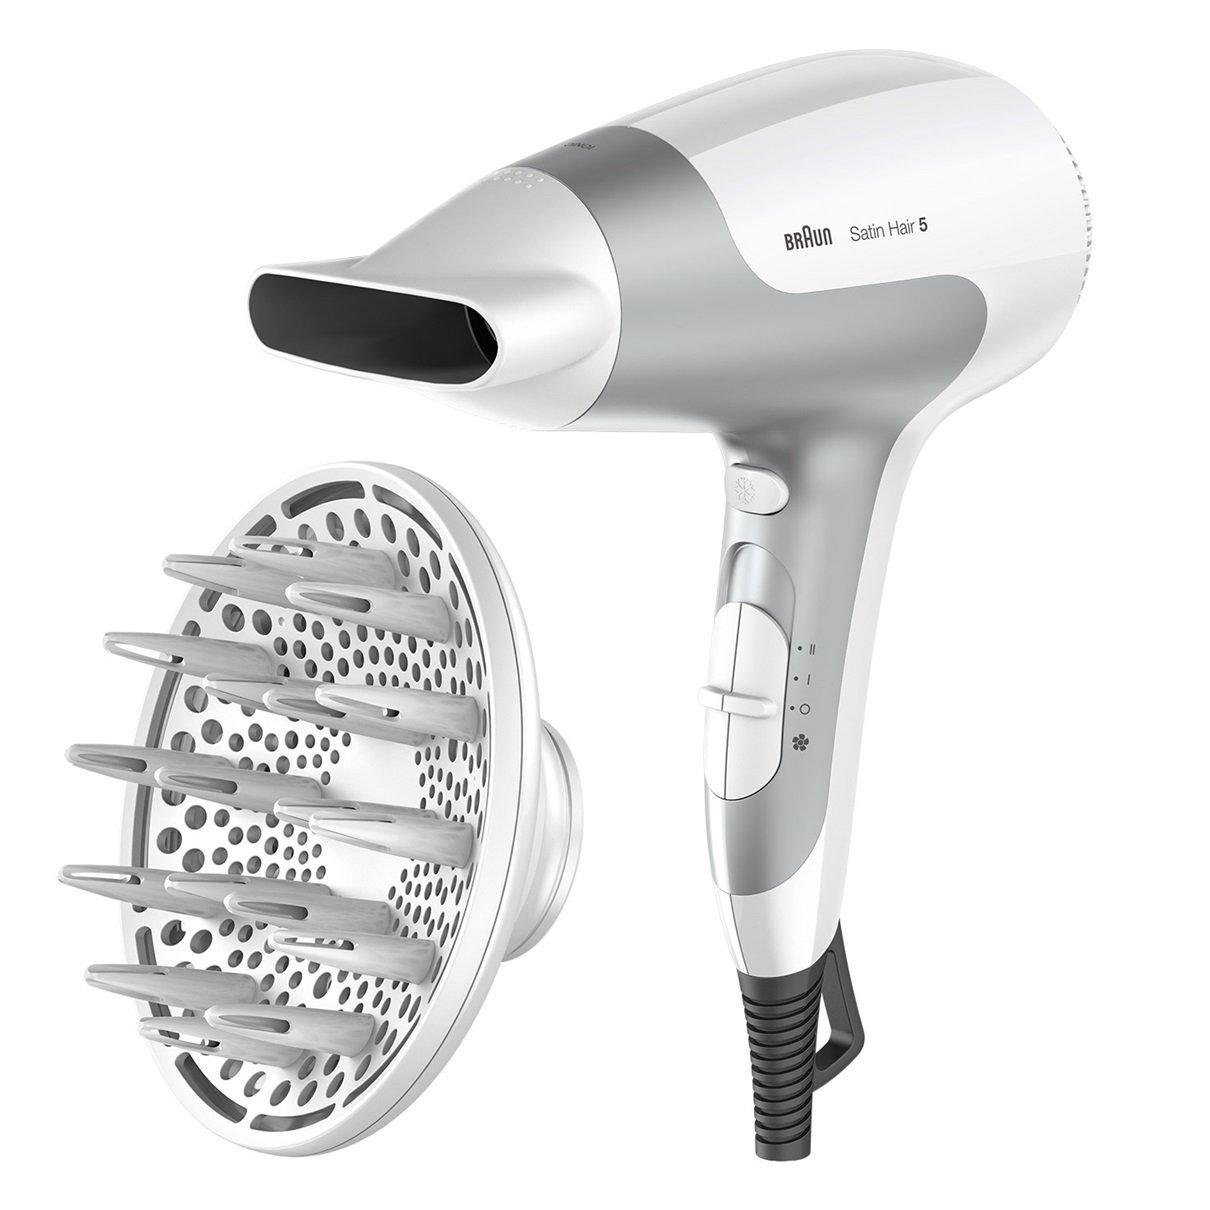 Braun Satin Hair 5 PowerPerfection Dryer HD585